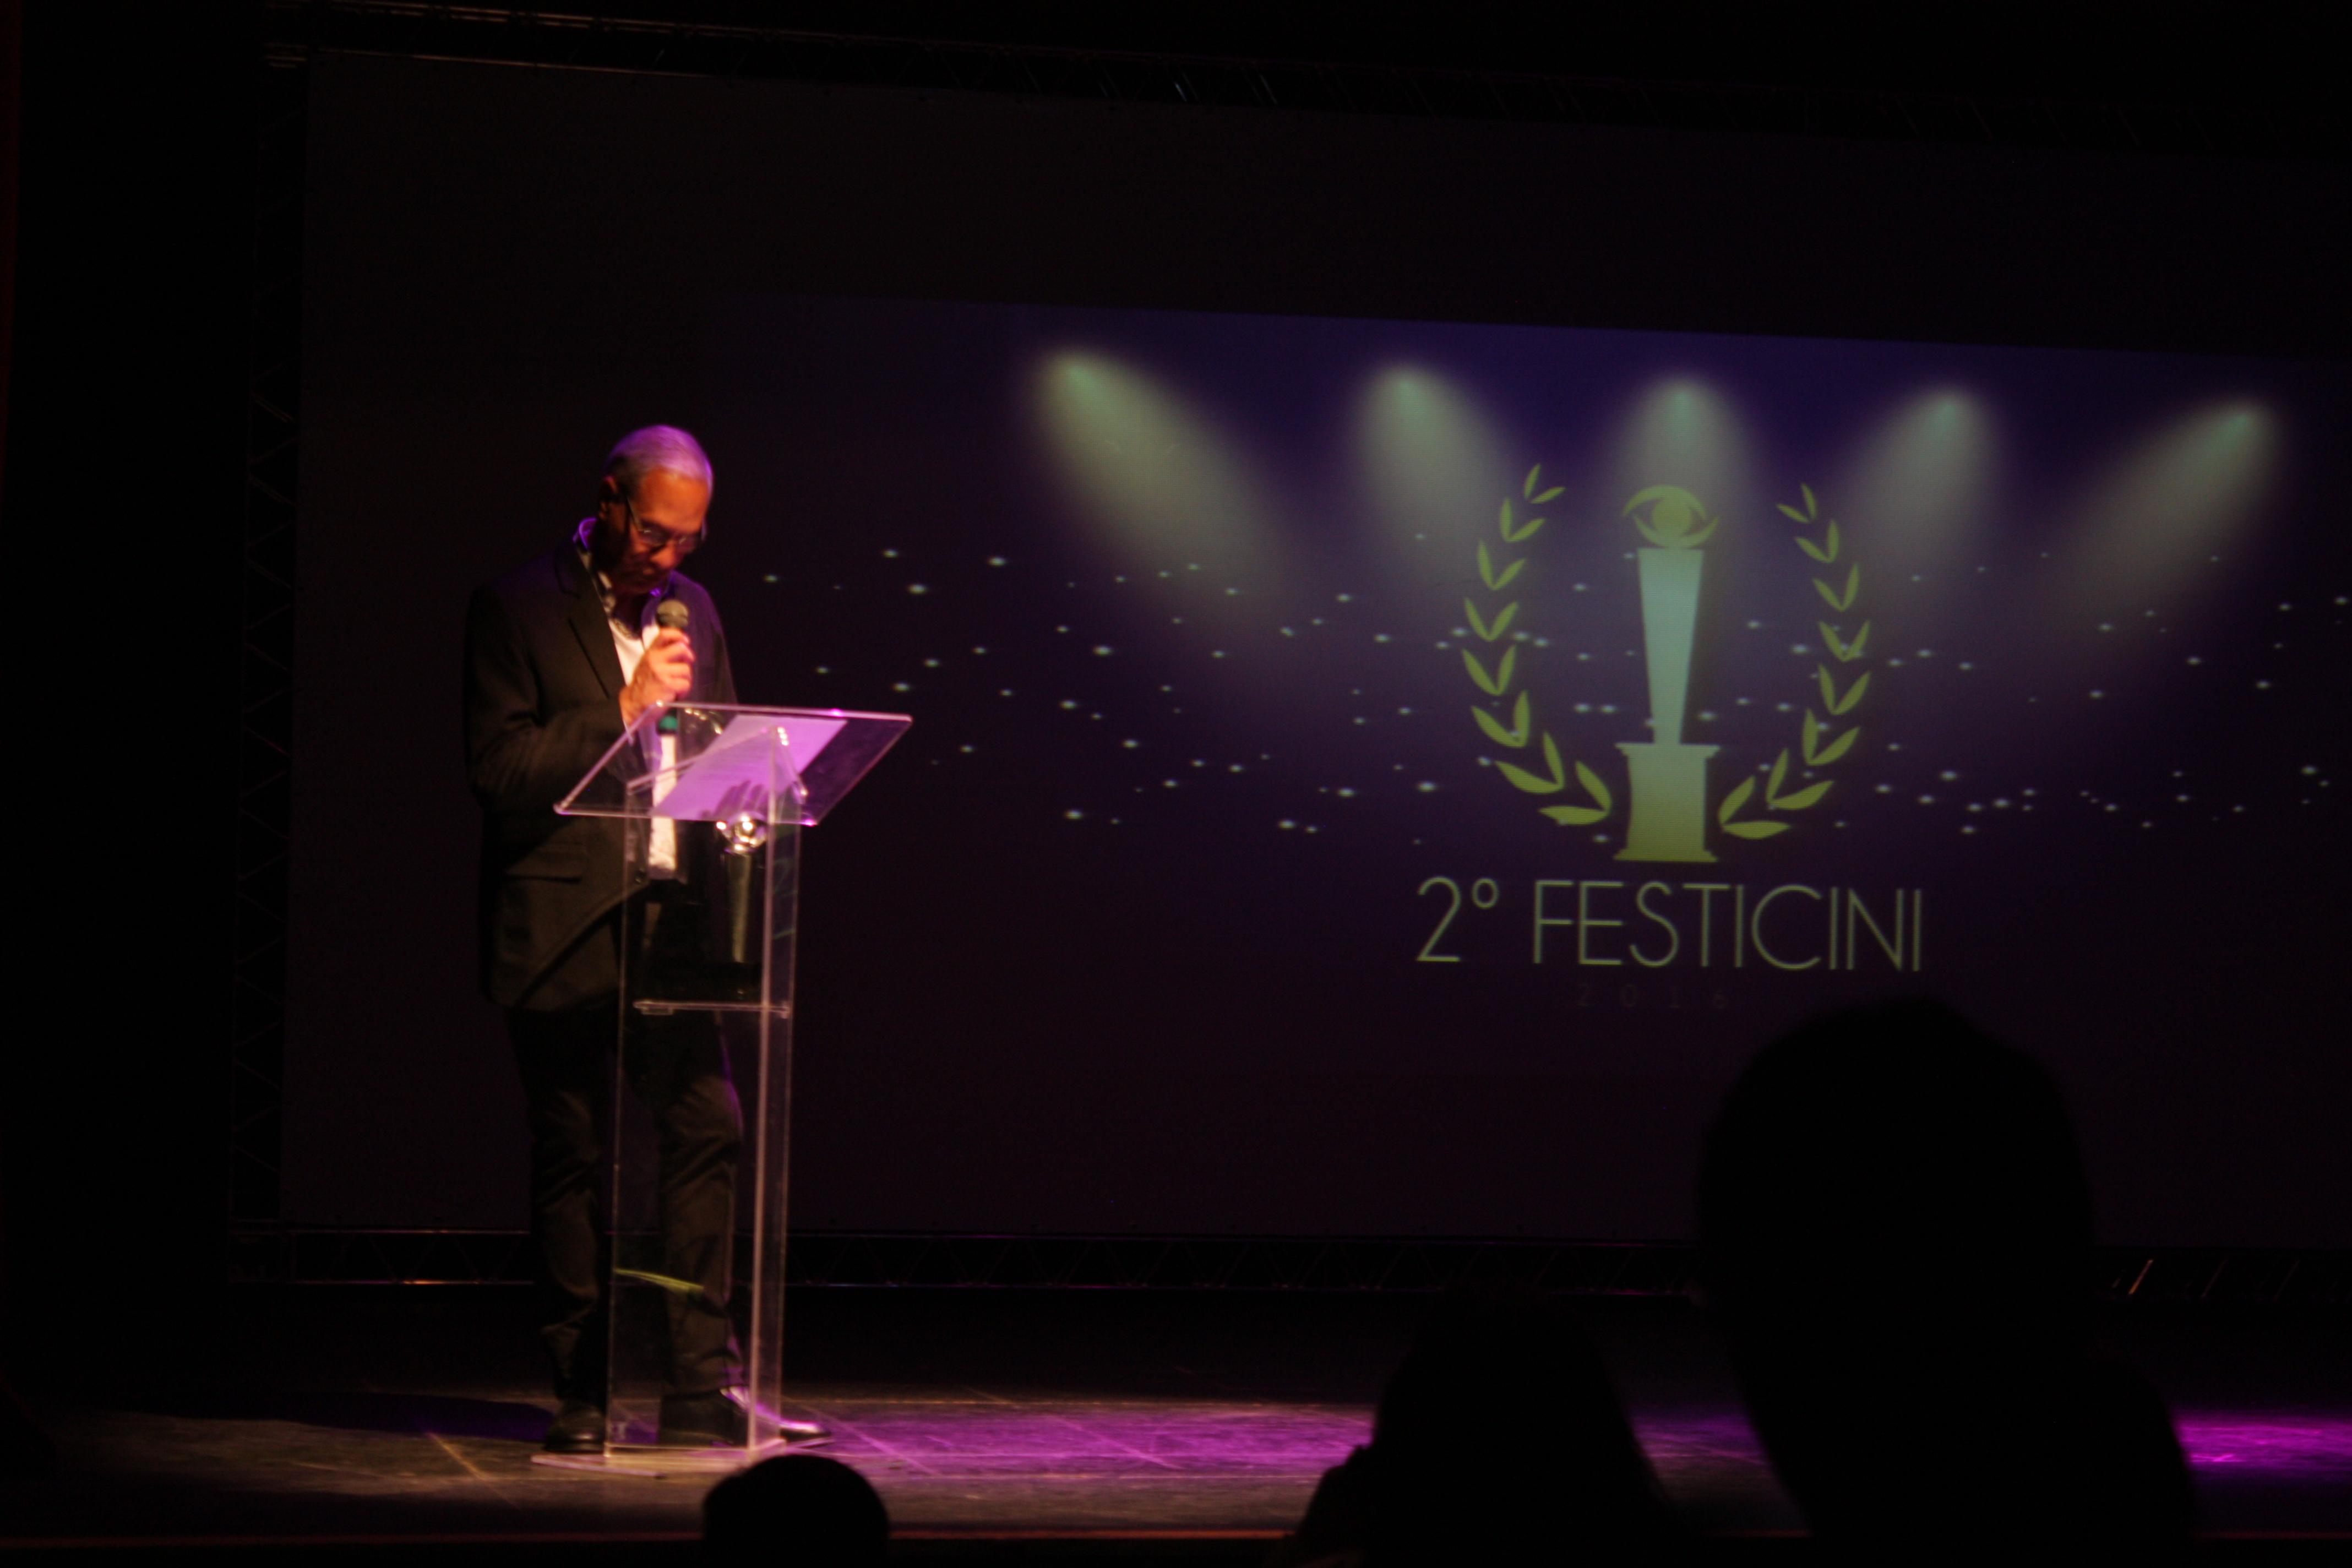 Carlos Braga -  organizador do  FESTICINI 2016